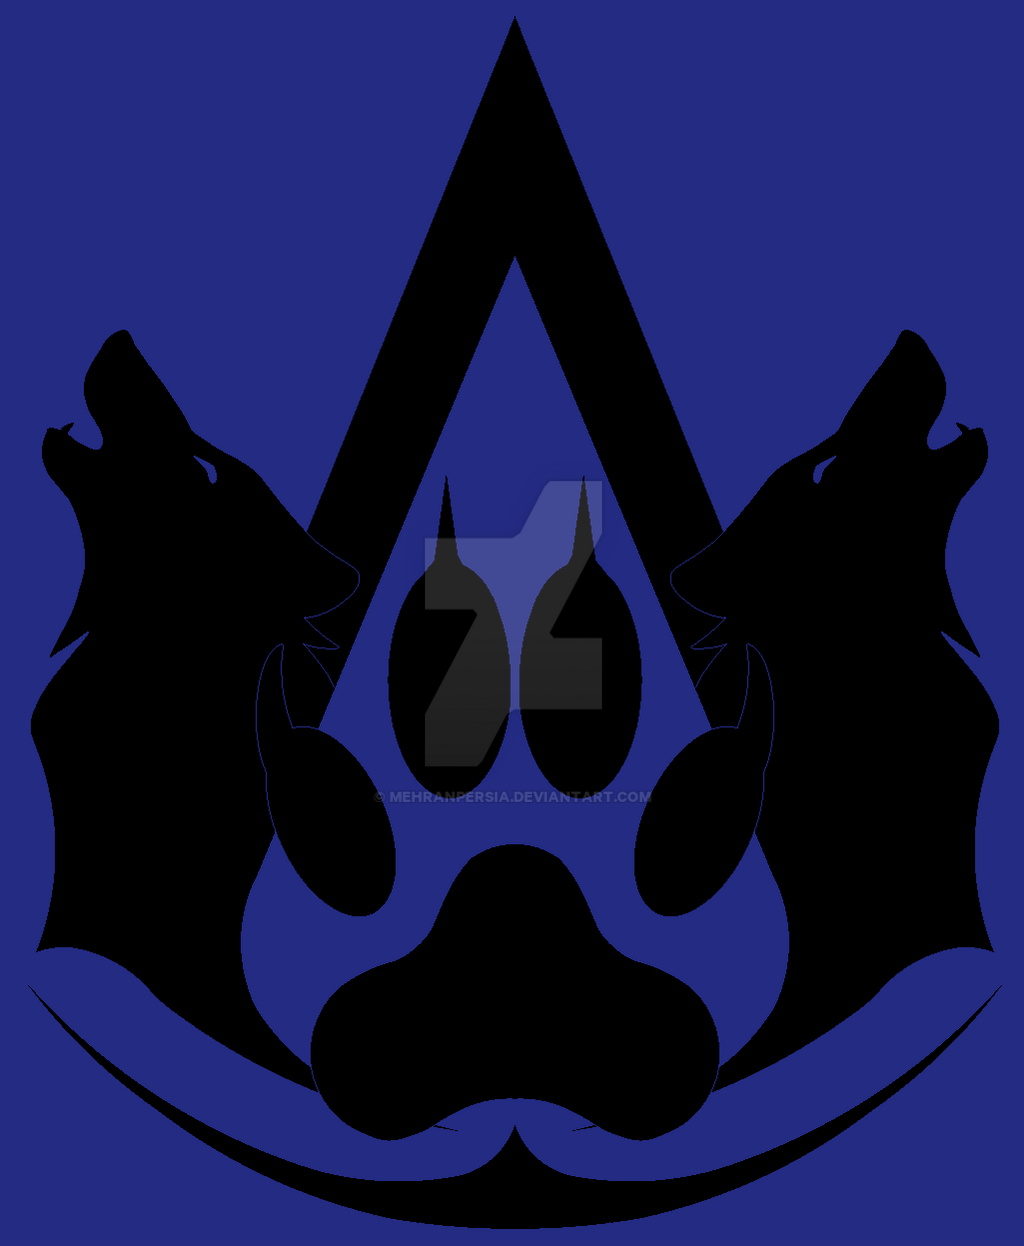 wolf assassin clan symbol by mehranpersia on deviantart